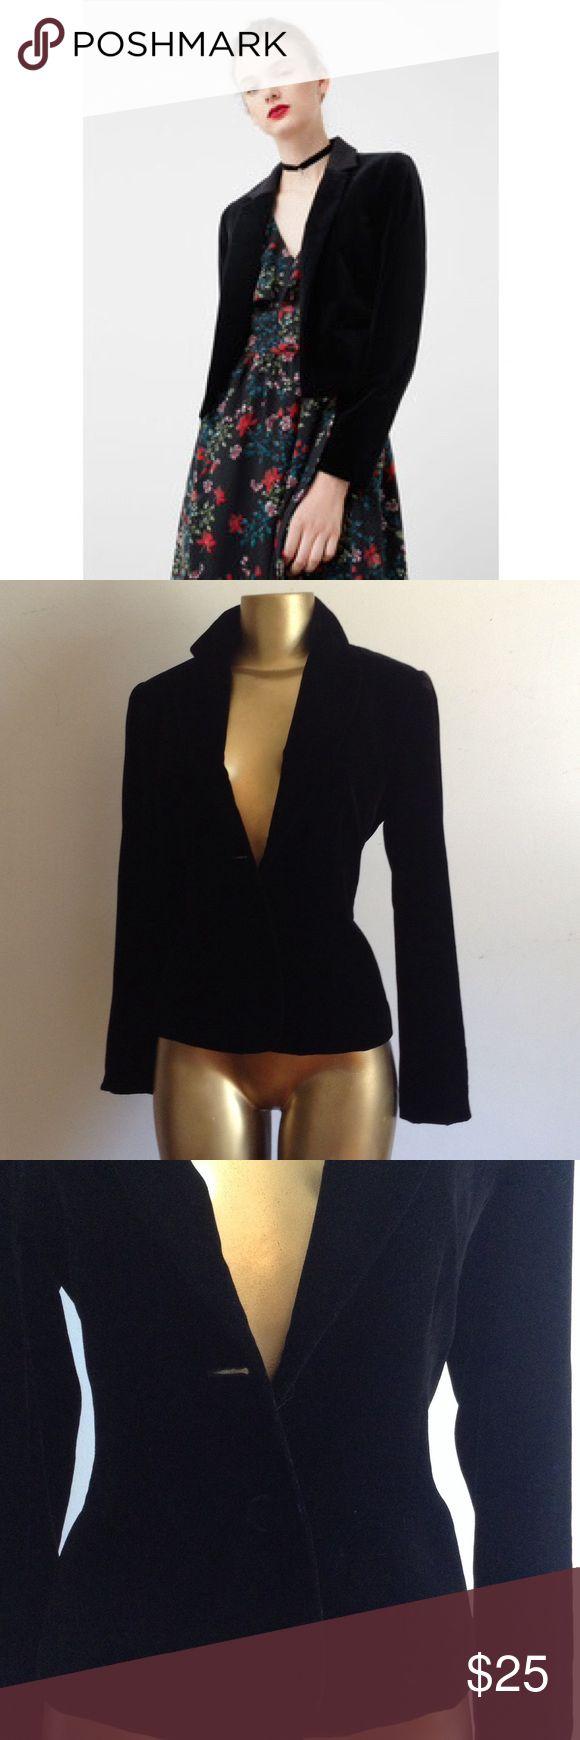 🌹 WARDROBE ESSENTIAL BLACK VELVET BLAZER🌹 🌹 WARDROBE ESSENTIAL BLACK VELVET BLAZER HAS ONE MISSING BUTTON🌹 Rafaella Jackets & Coats Blazers